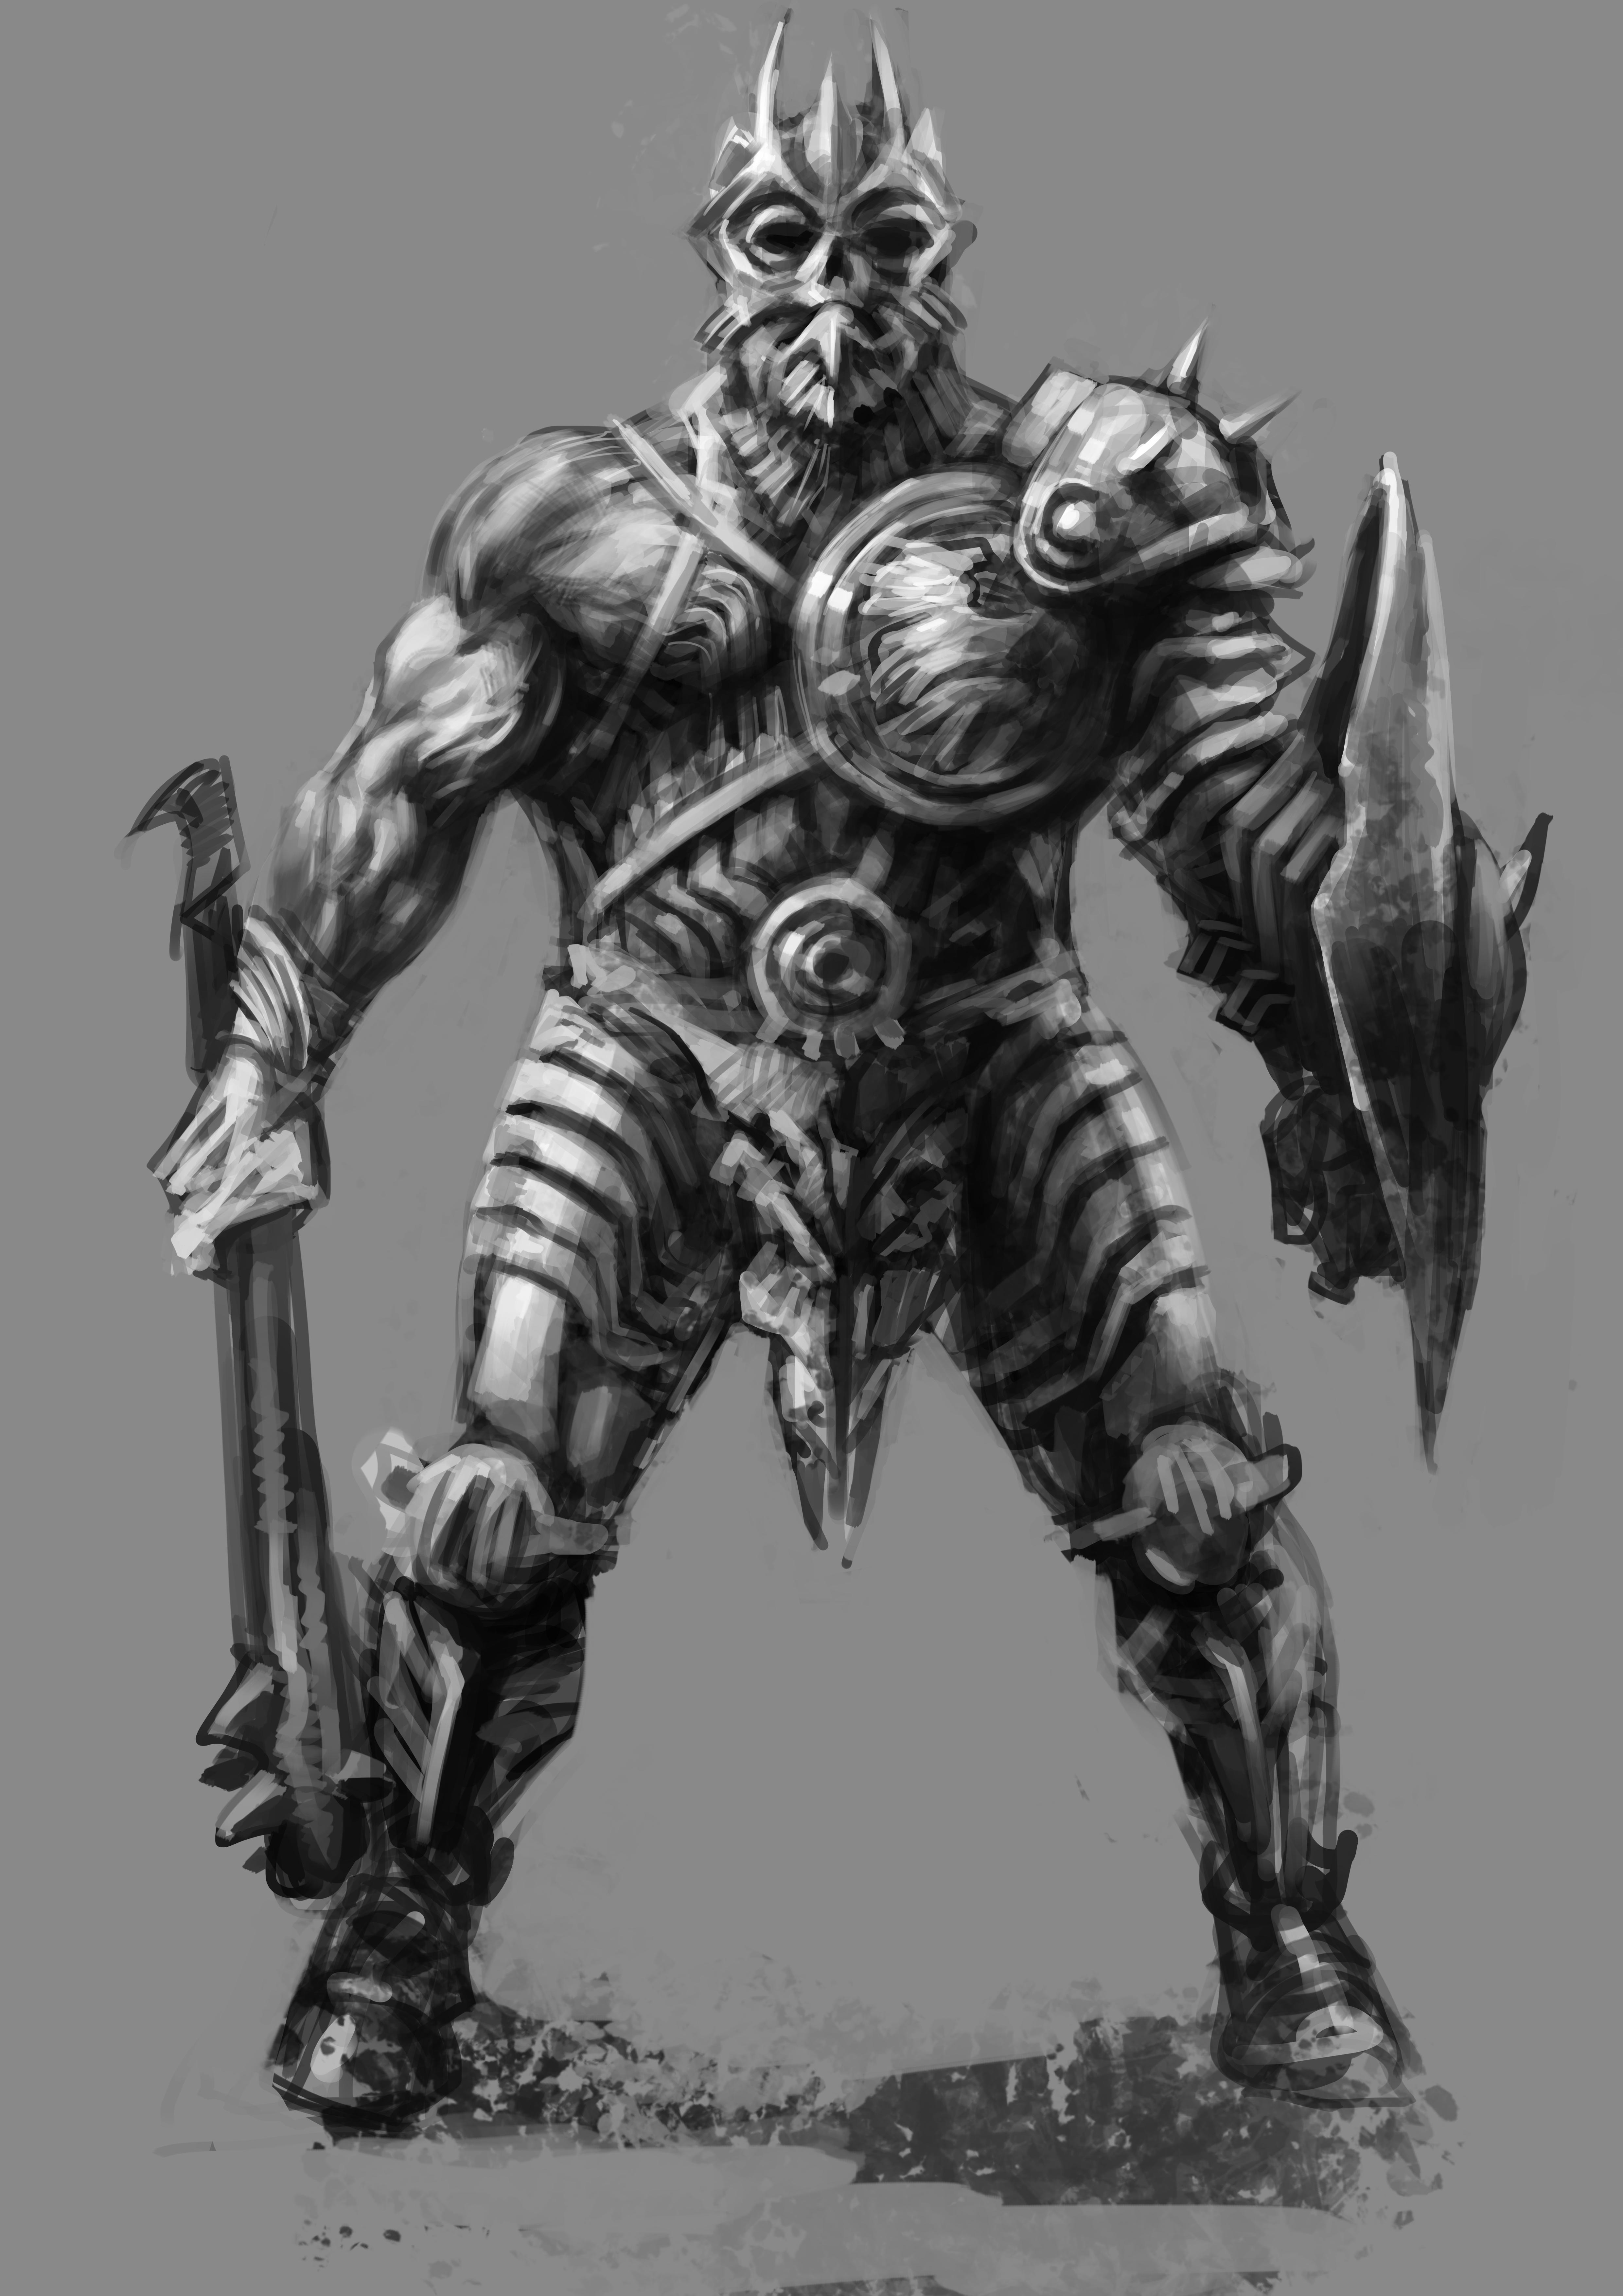 Knight_002